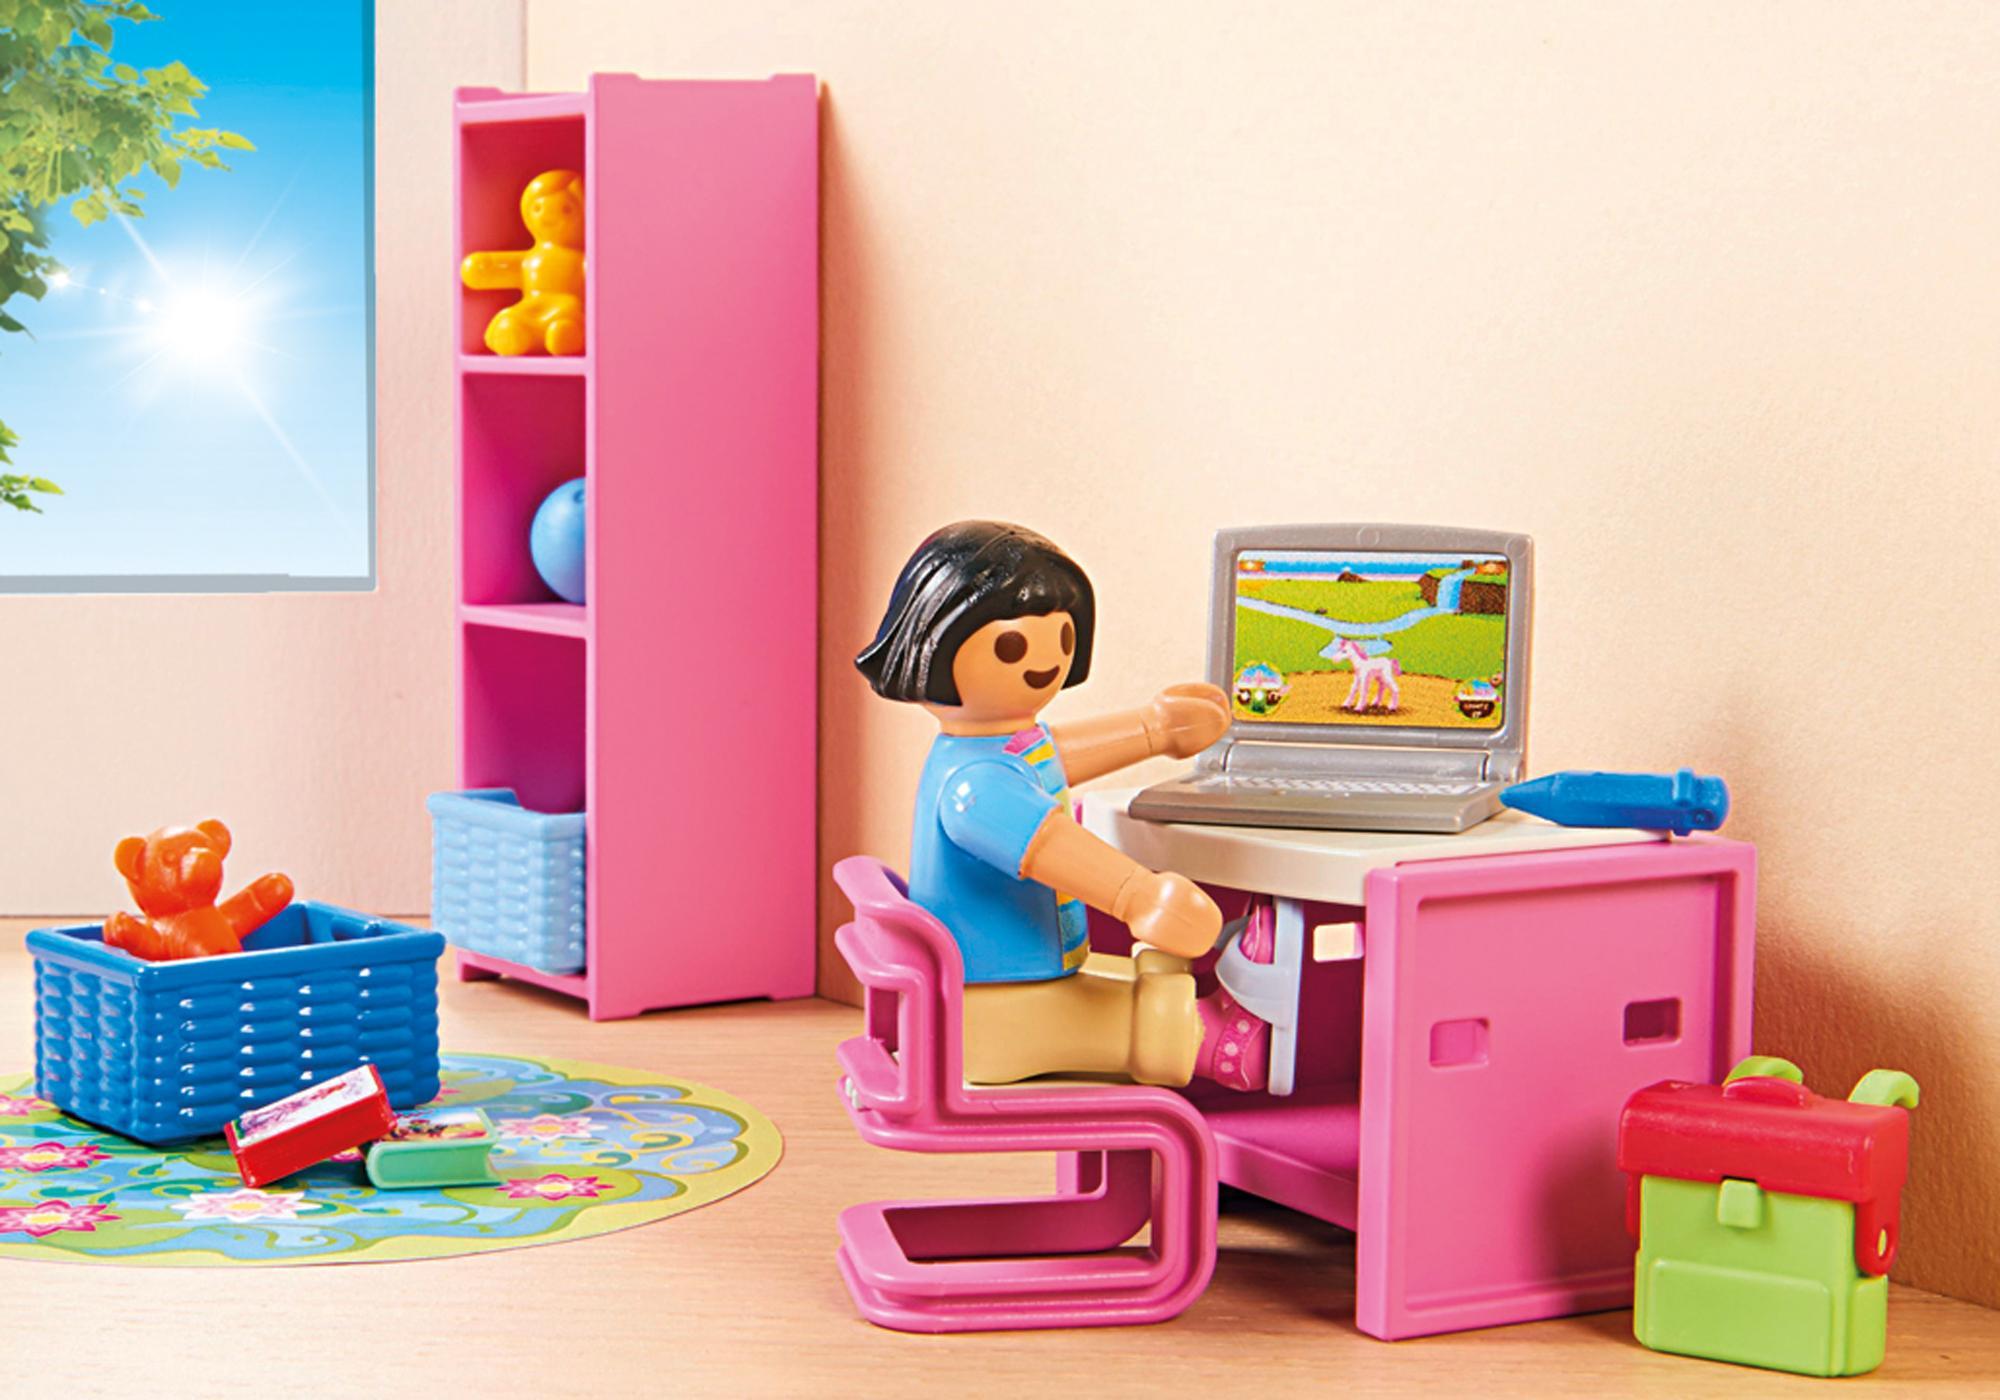 http://media.playmobil.com/i/playmobil/9270_product_extra2/Kinderkamer met hoogslaper